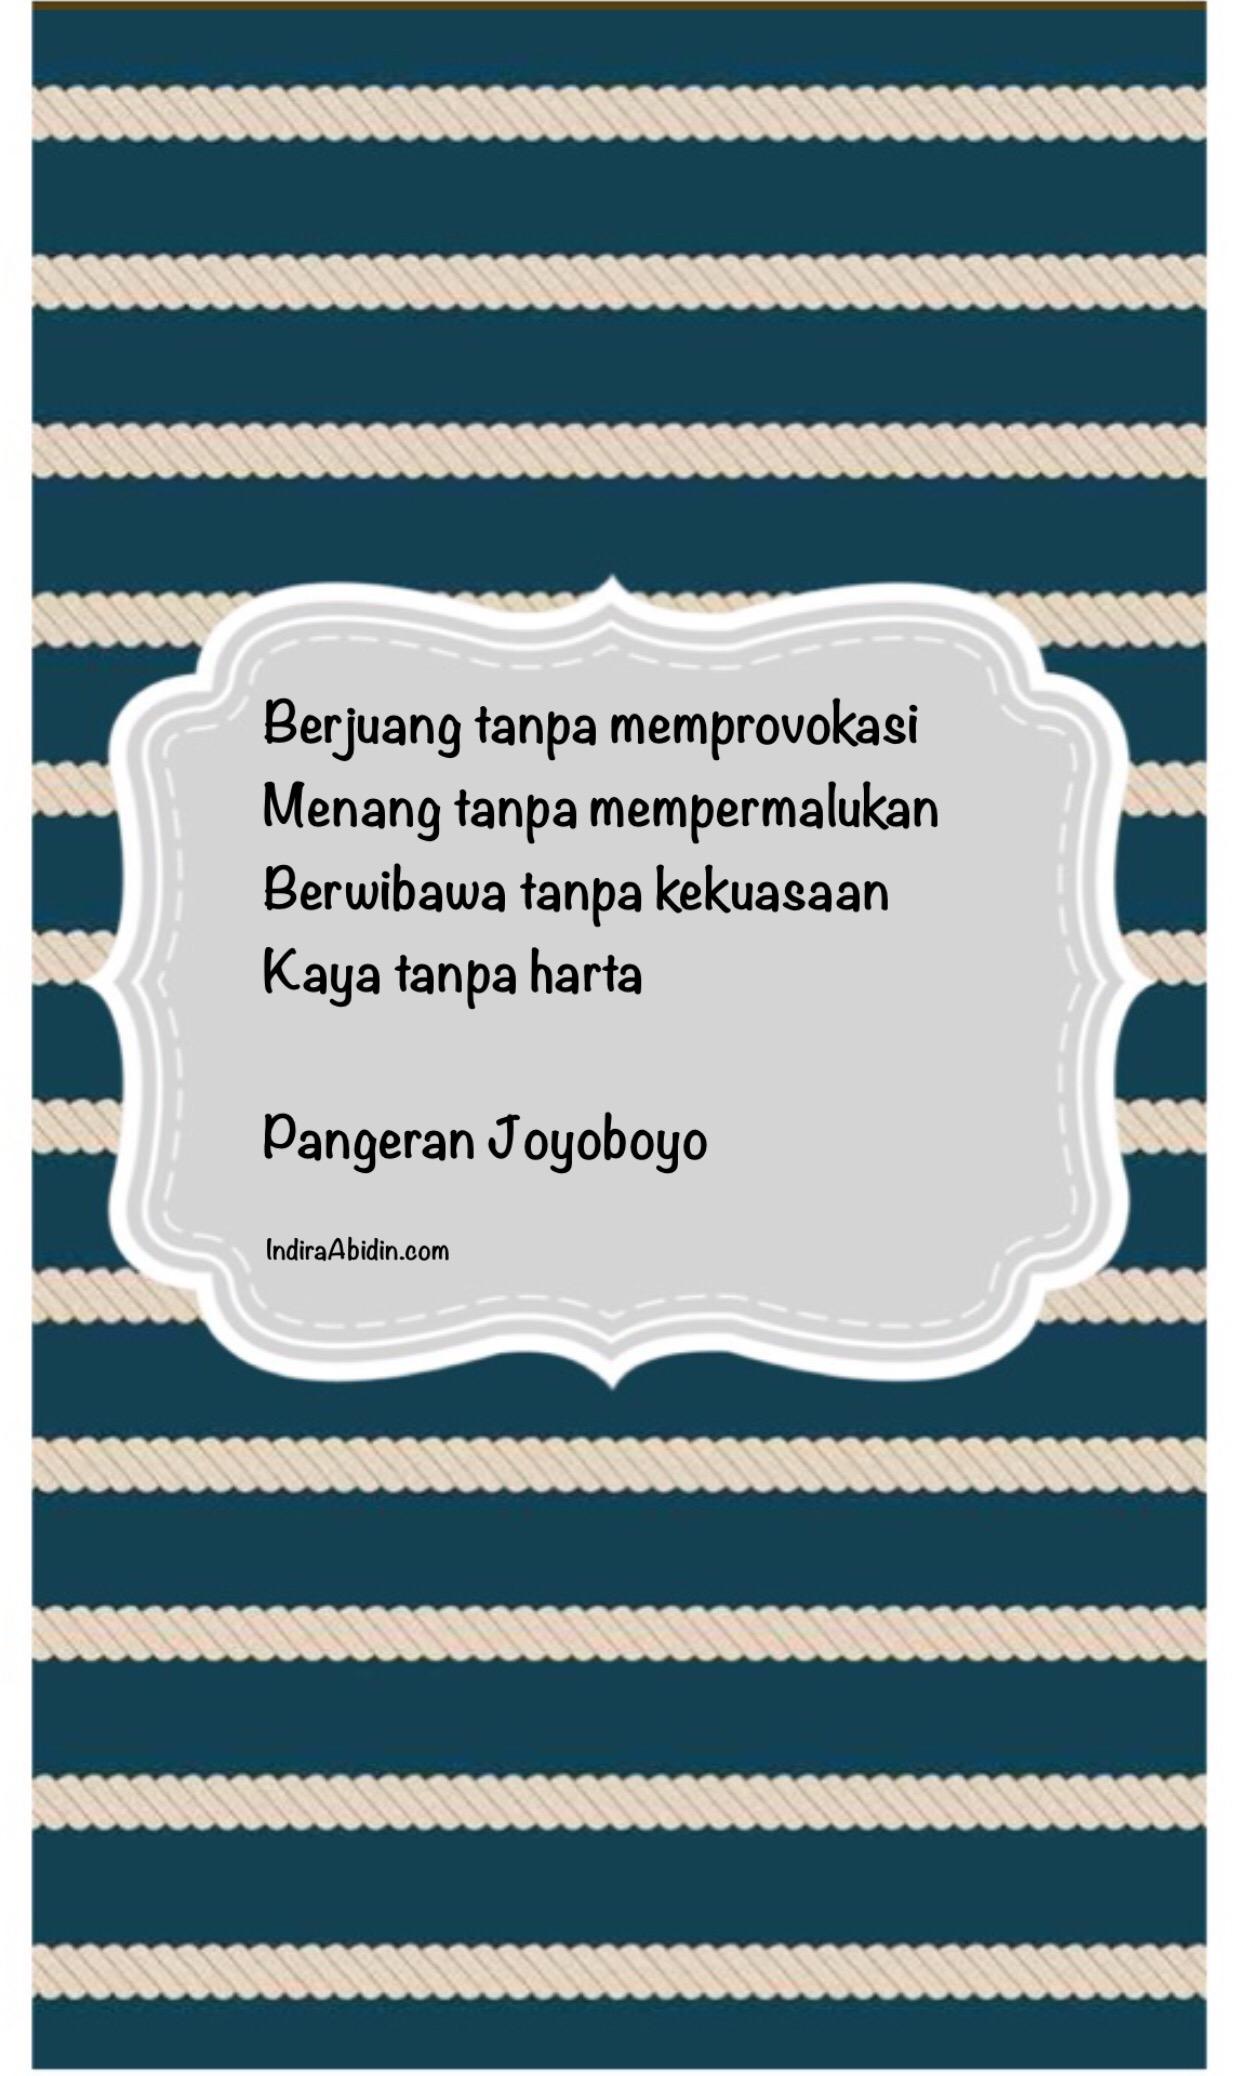 10 Filosofi Jawa Dari Pangeran Joyoboyo Indira Abidins Blog